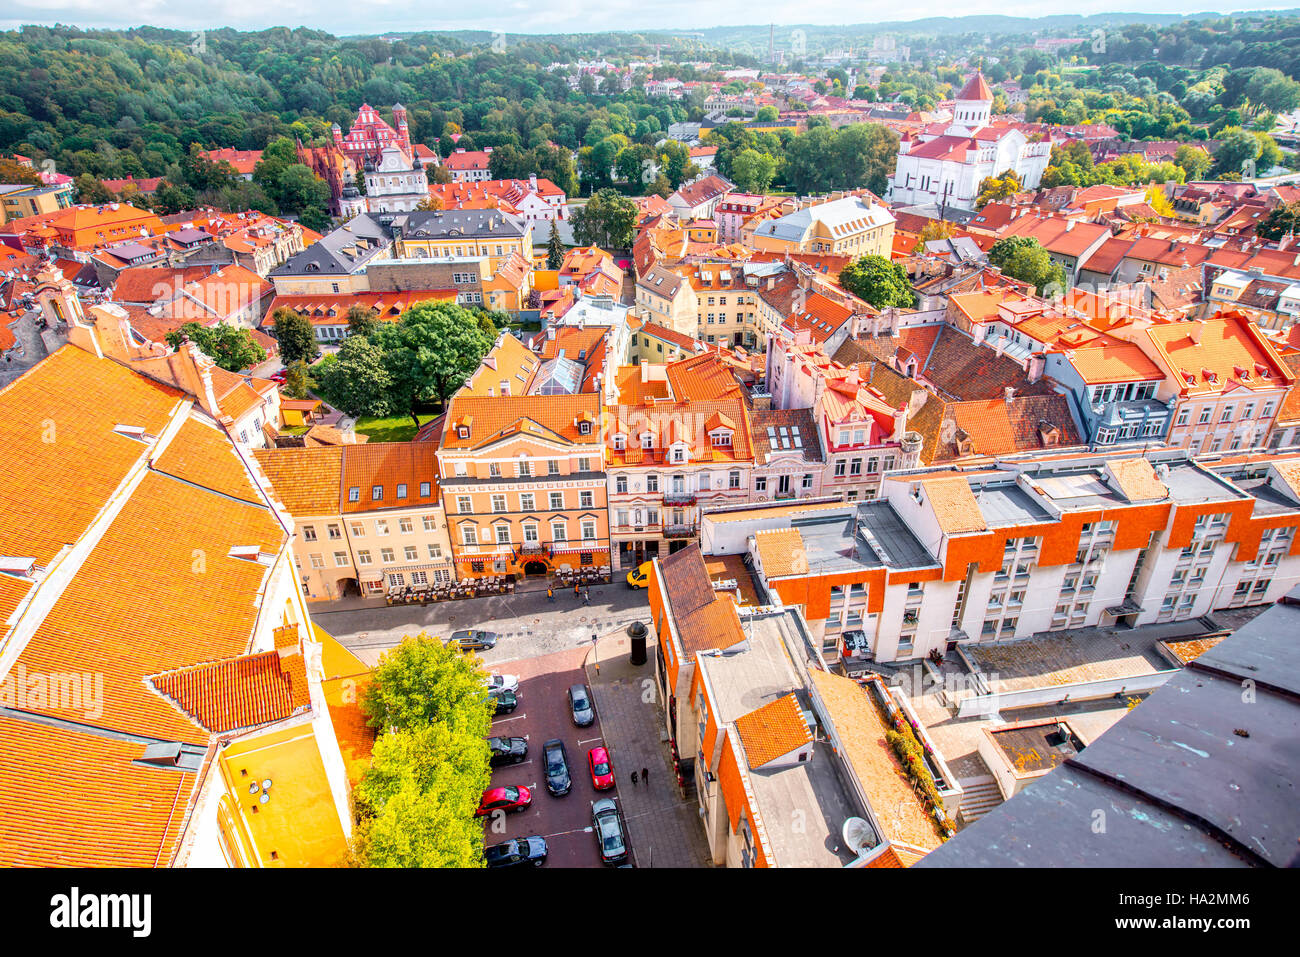 Vilnius cityscape view - Stock Image